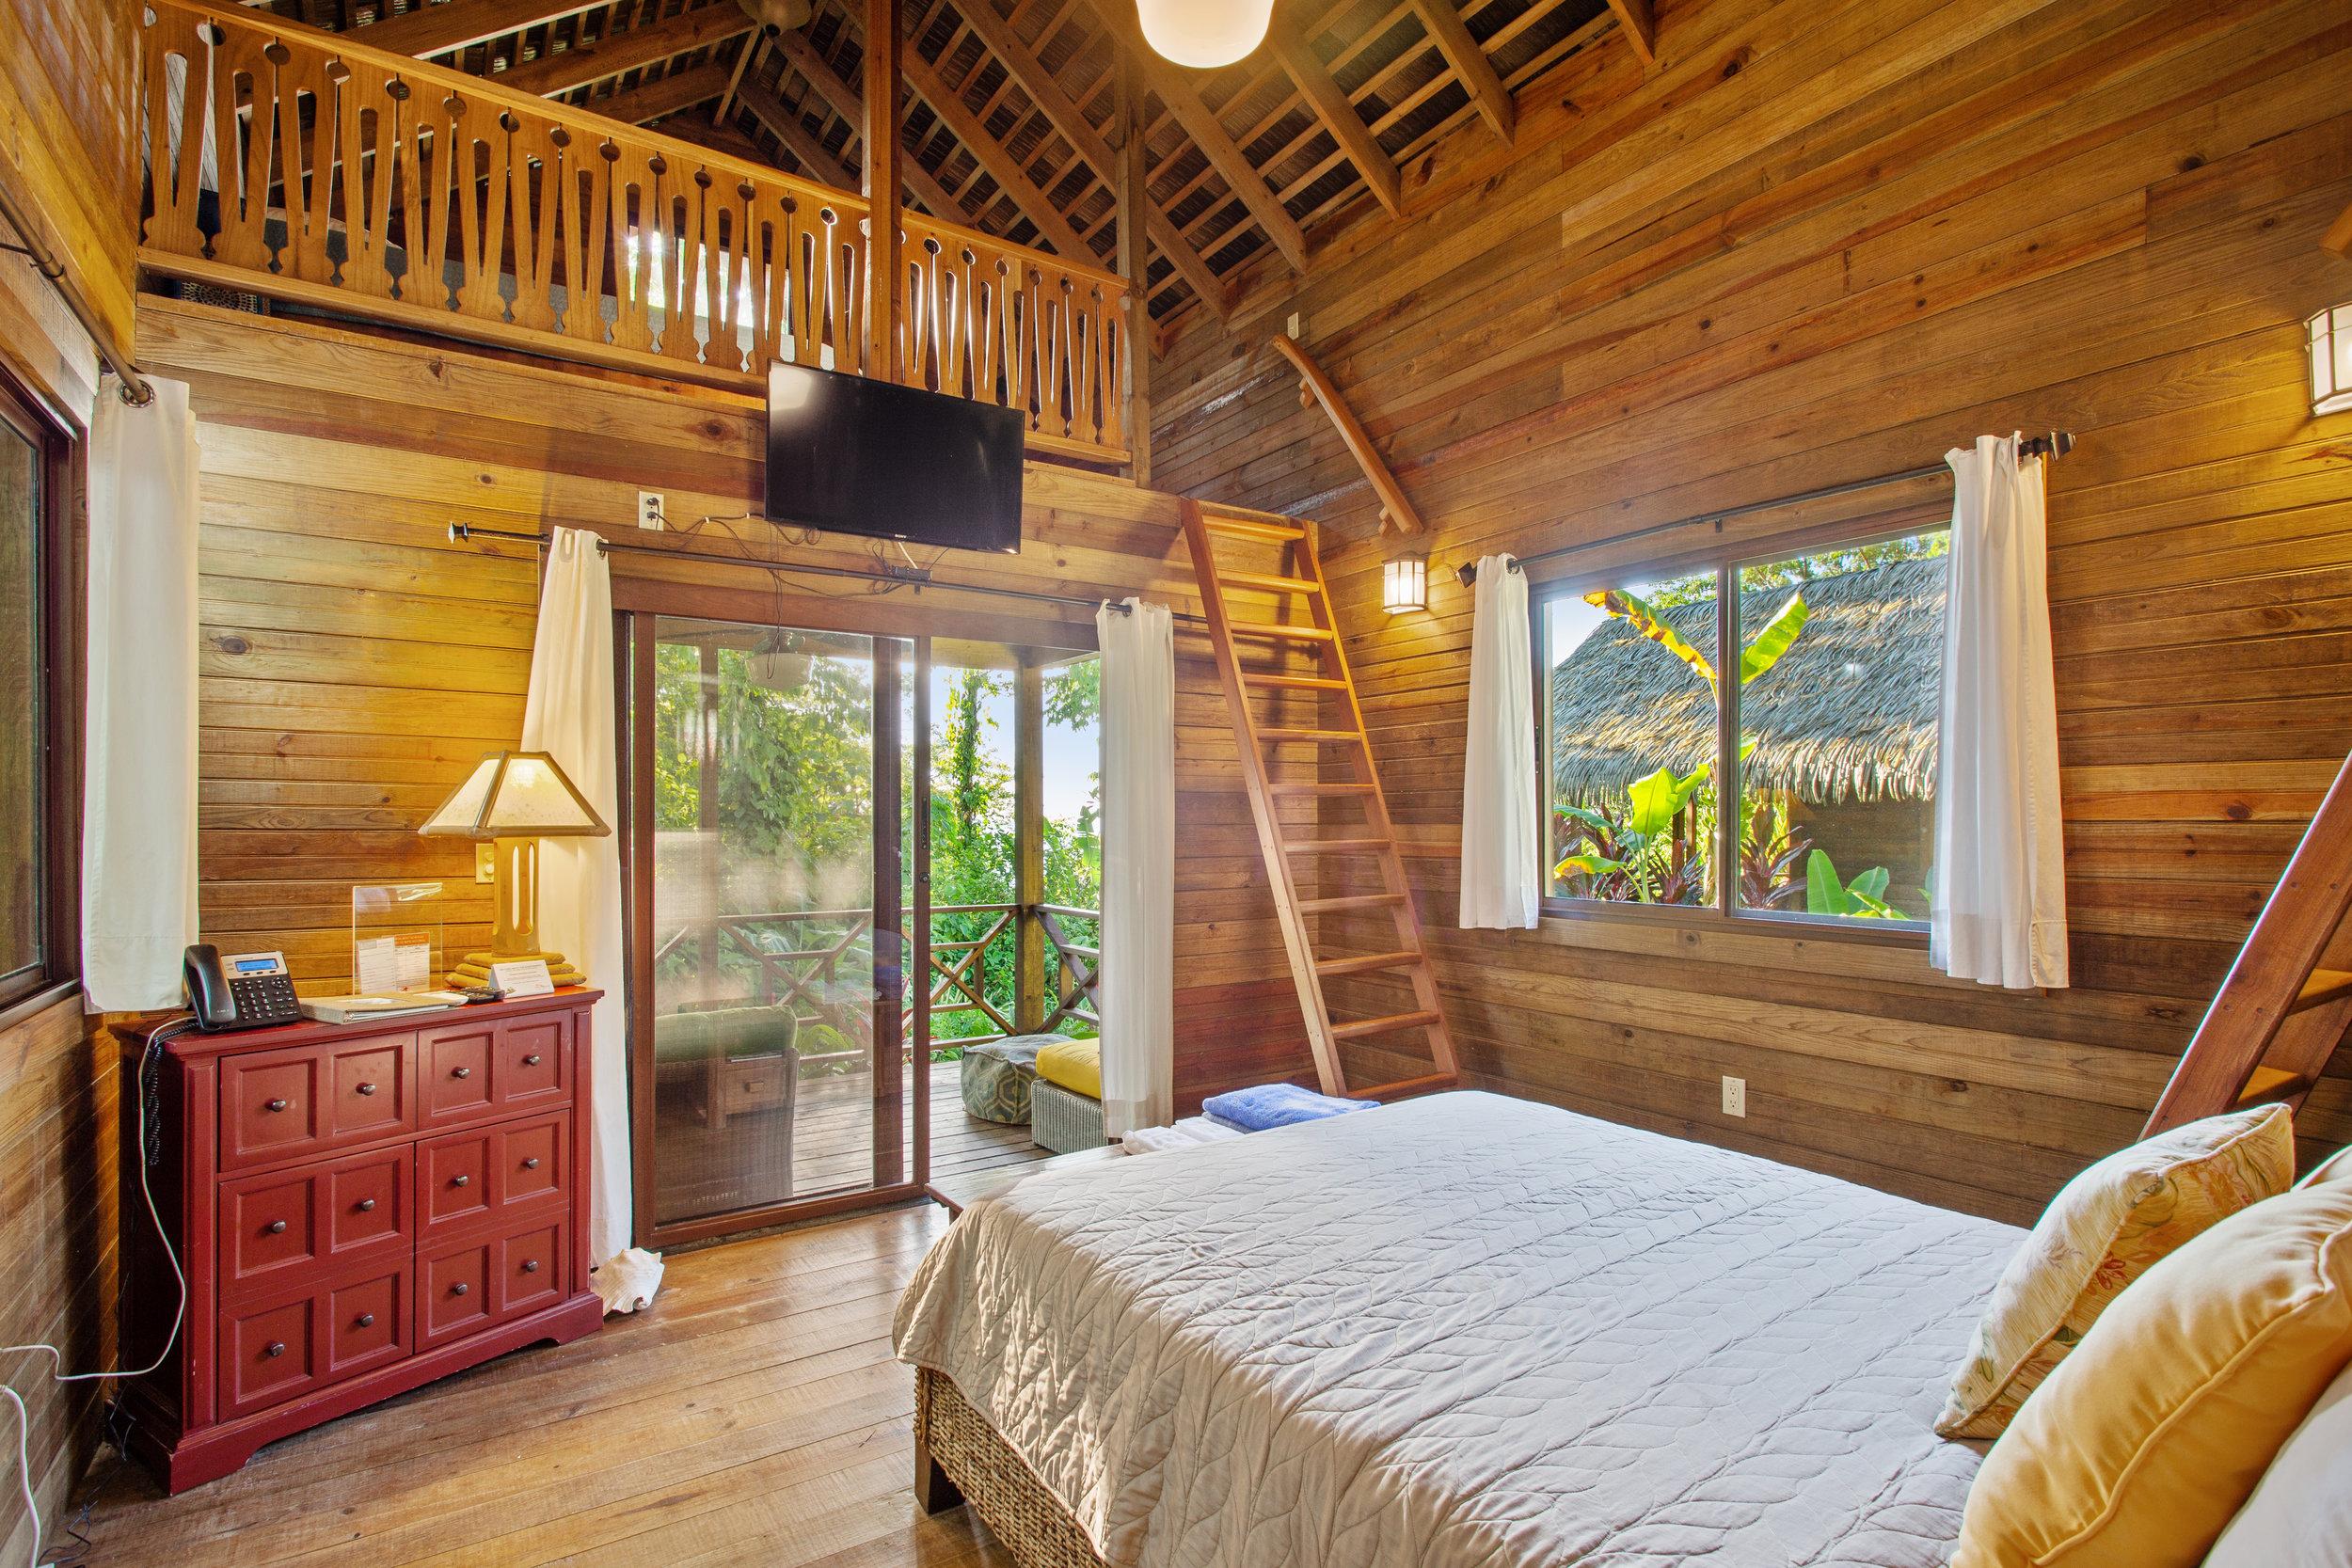 Jungle_Lodge_8_DuarteDellarole4.JPG